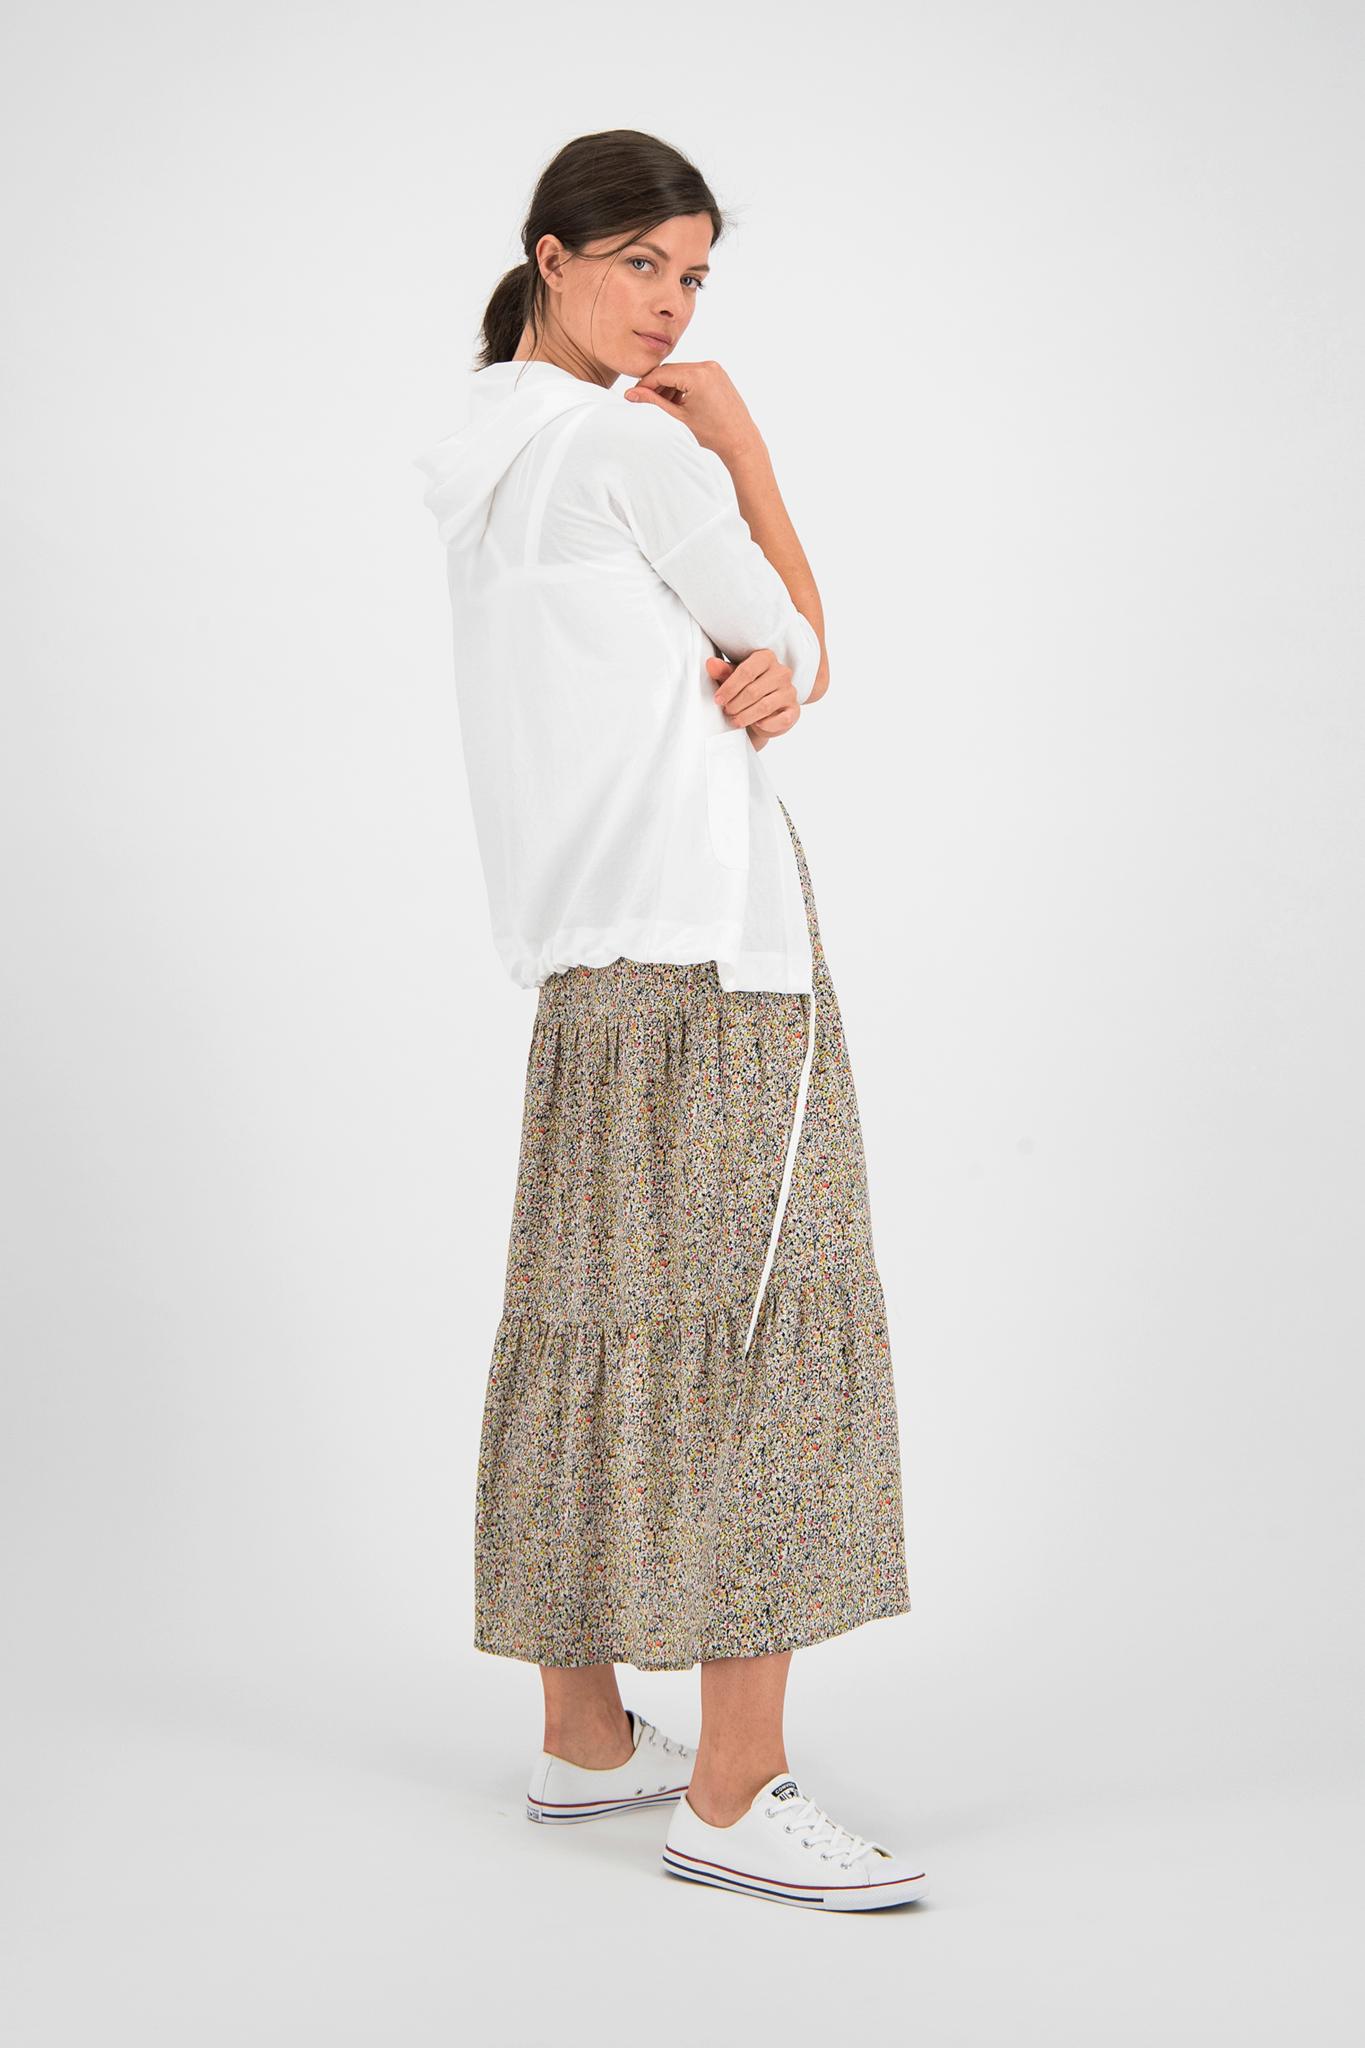 SYLVER Mille Fleurs Skirt - Zwart